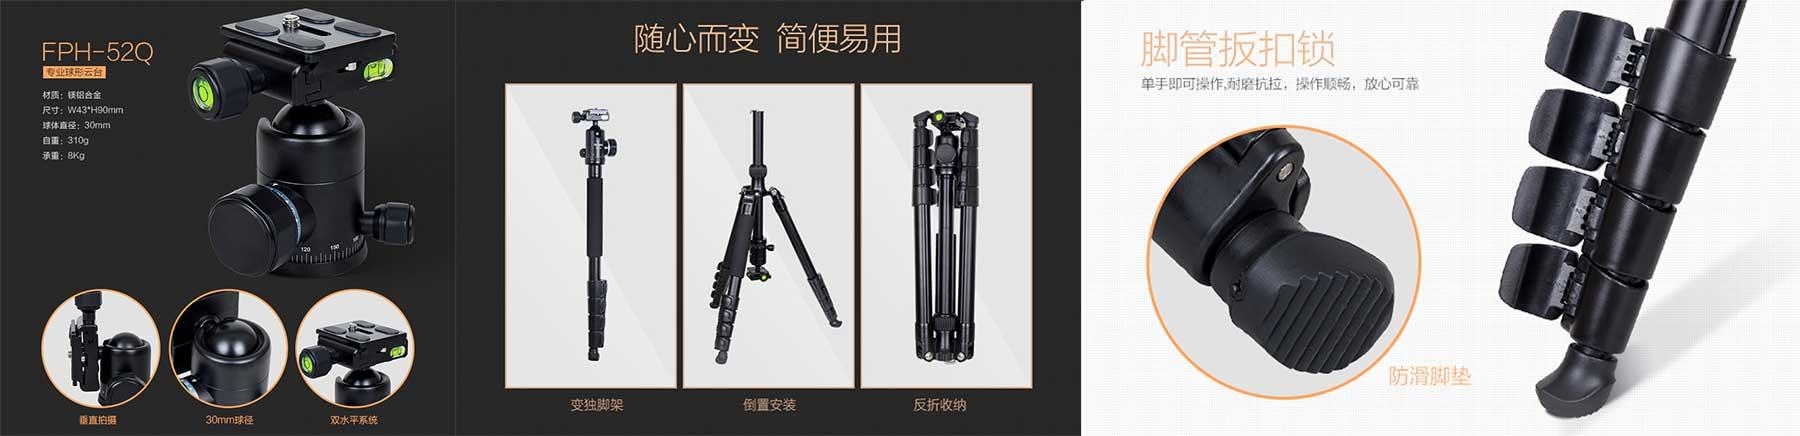 jual Fotopro S5plus+52Q Black Tripod toko kamera online plazakamera surabaya dan jakarta